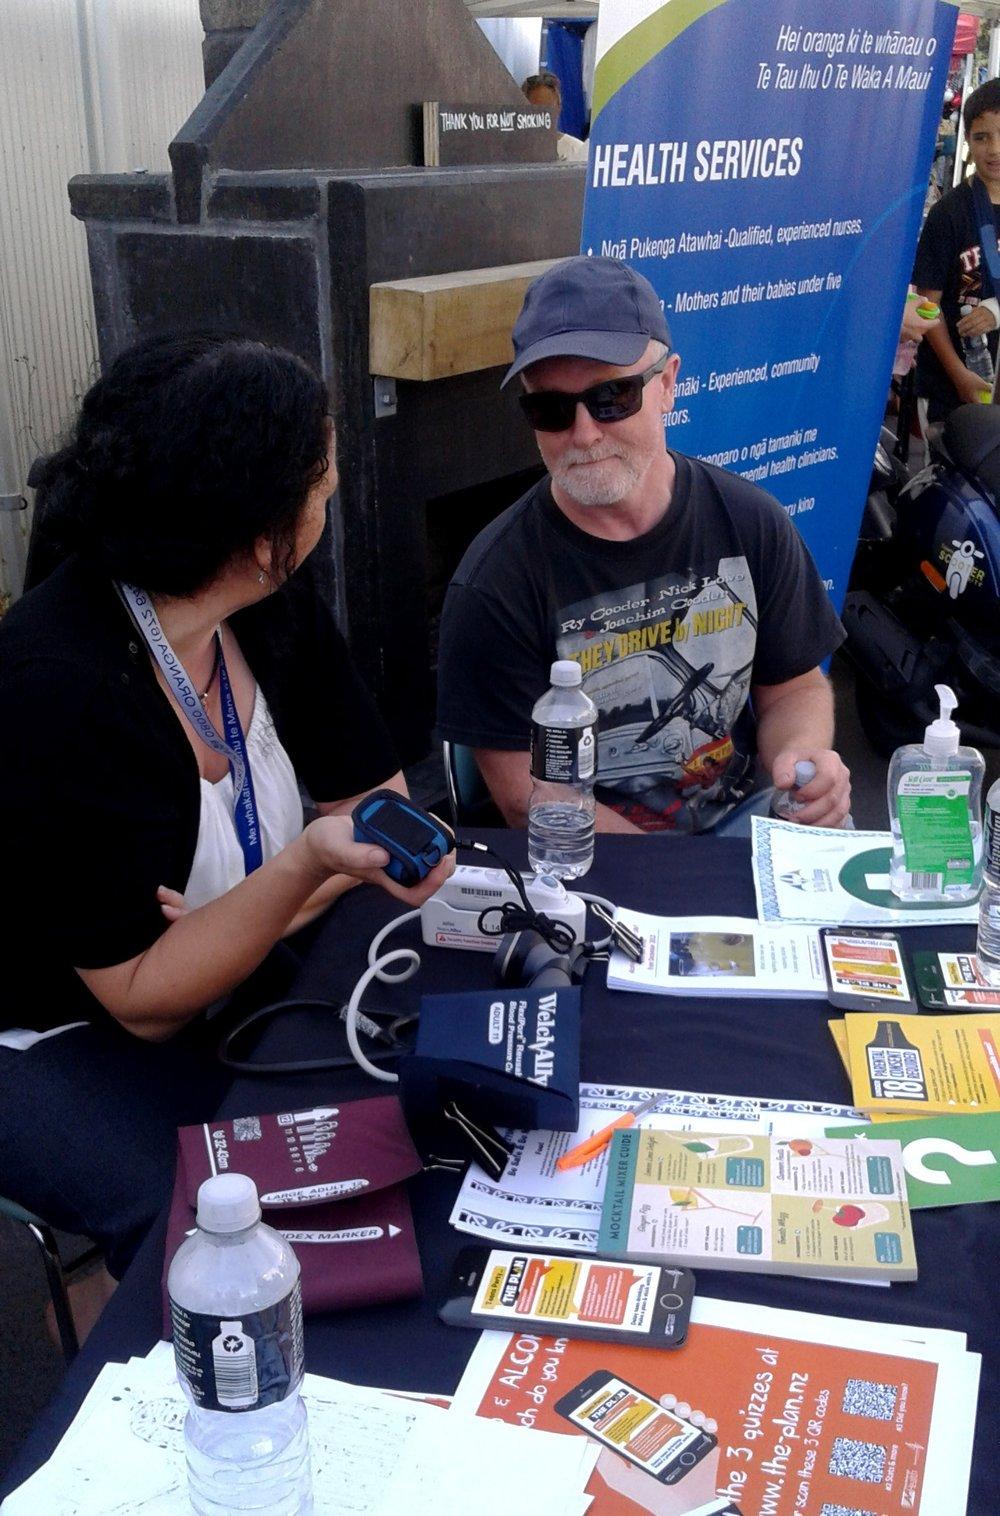 Derek Walker gets a TPO health check from Marissa